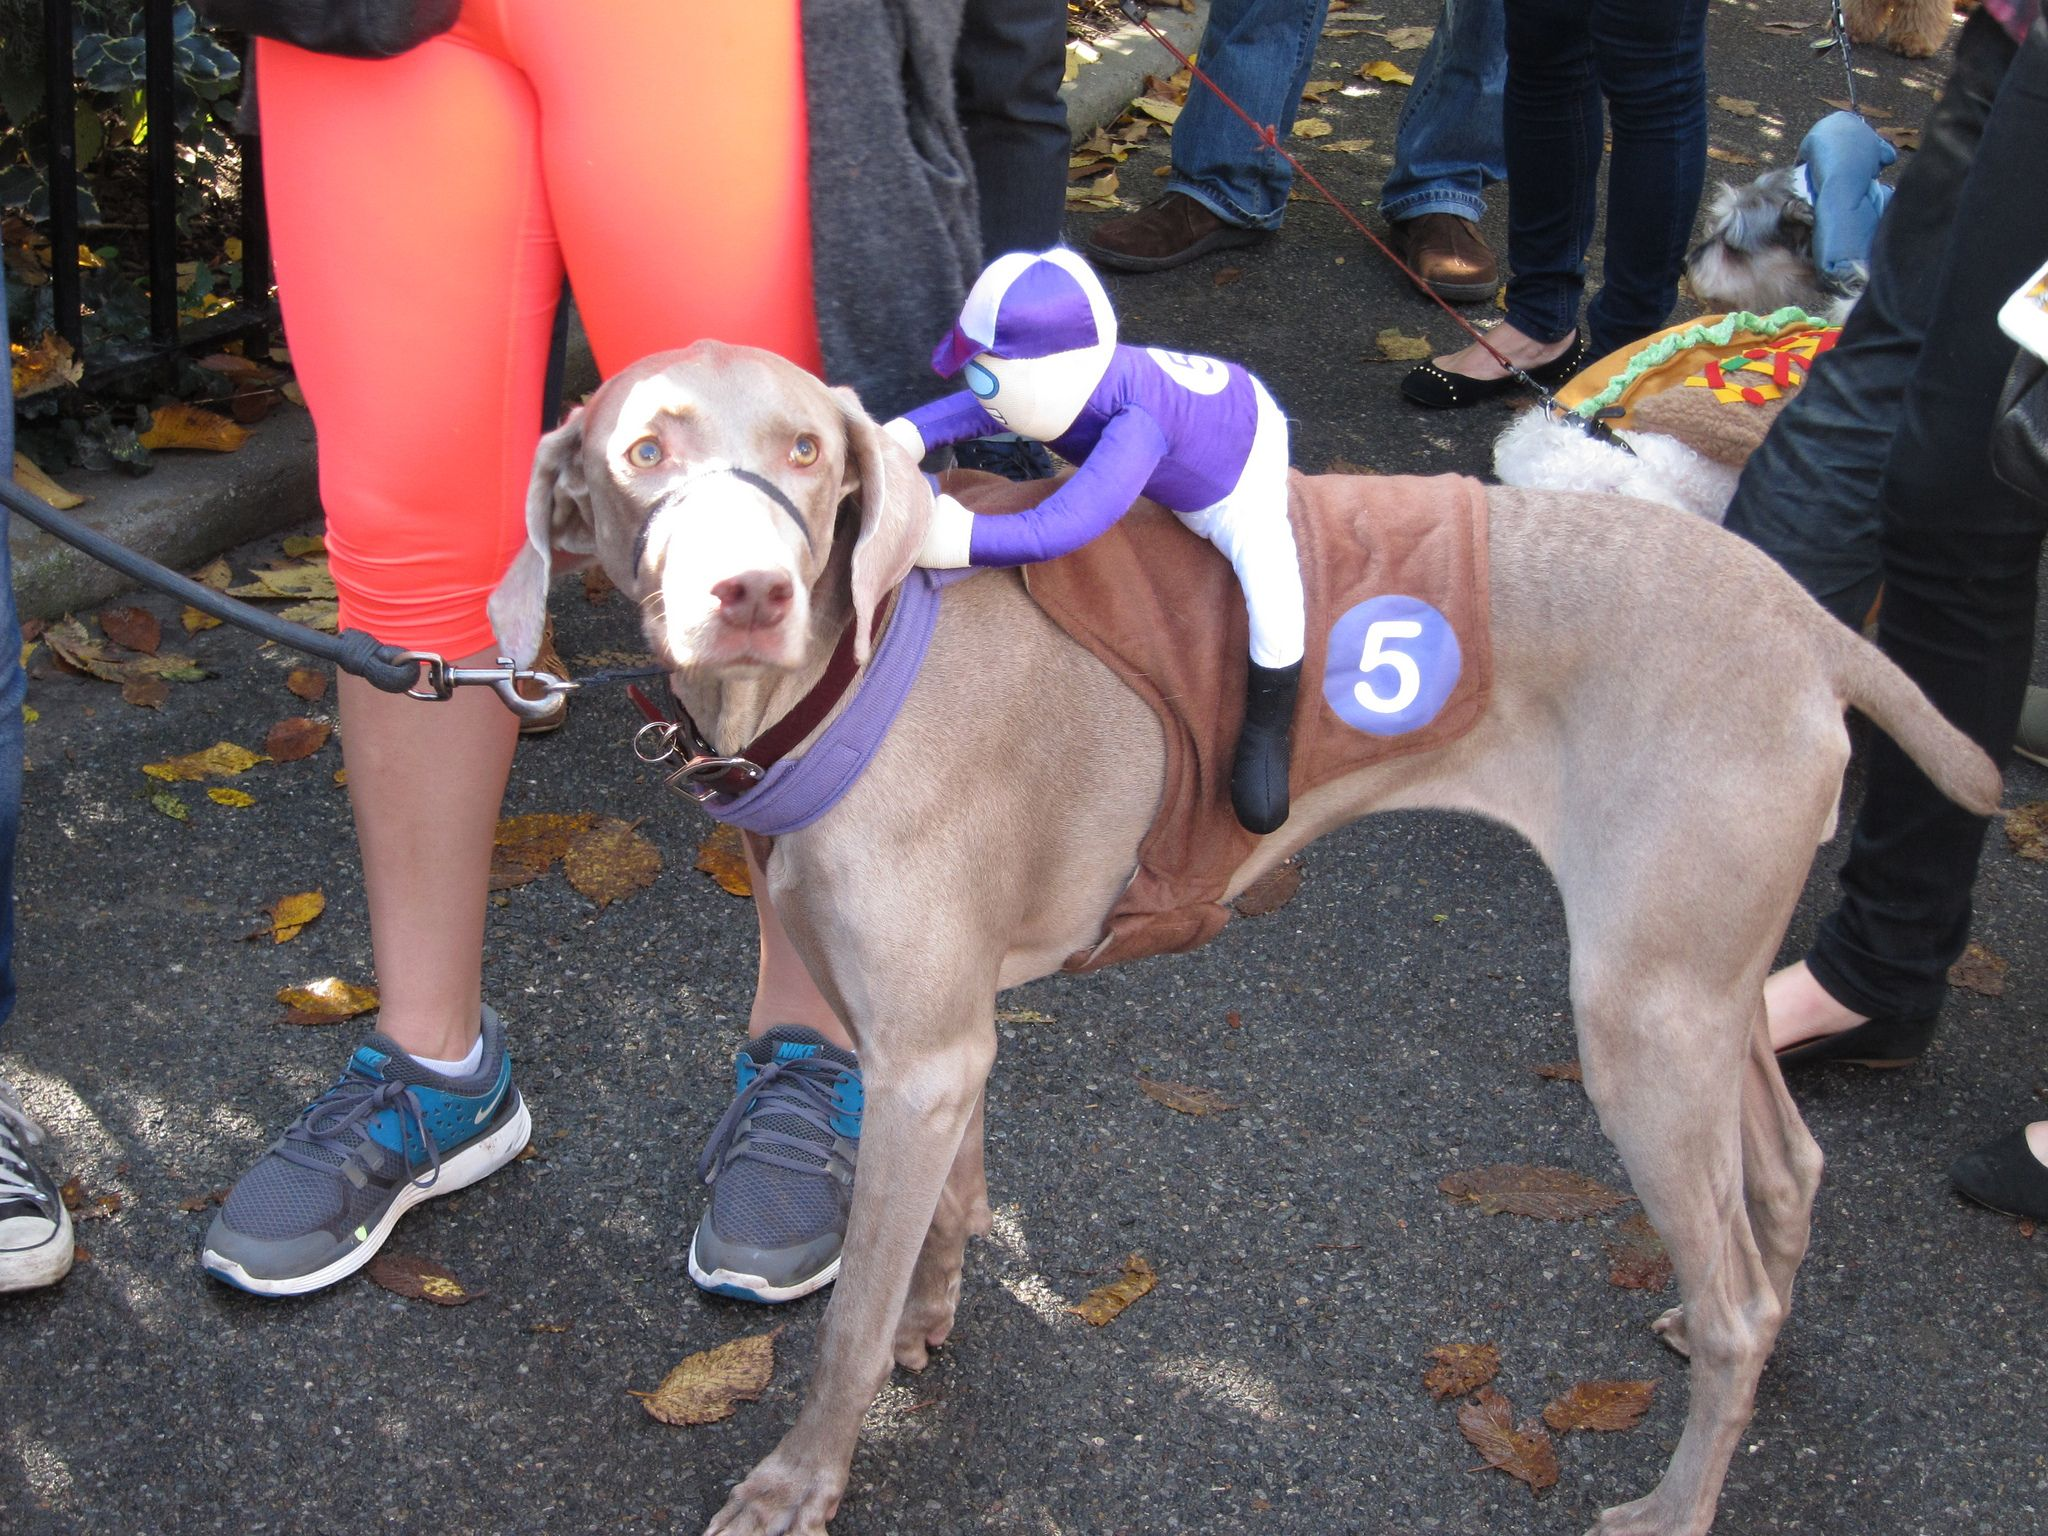 Weimeraner Race Dog Costume Big Dog Costumes Big Dog Halloween